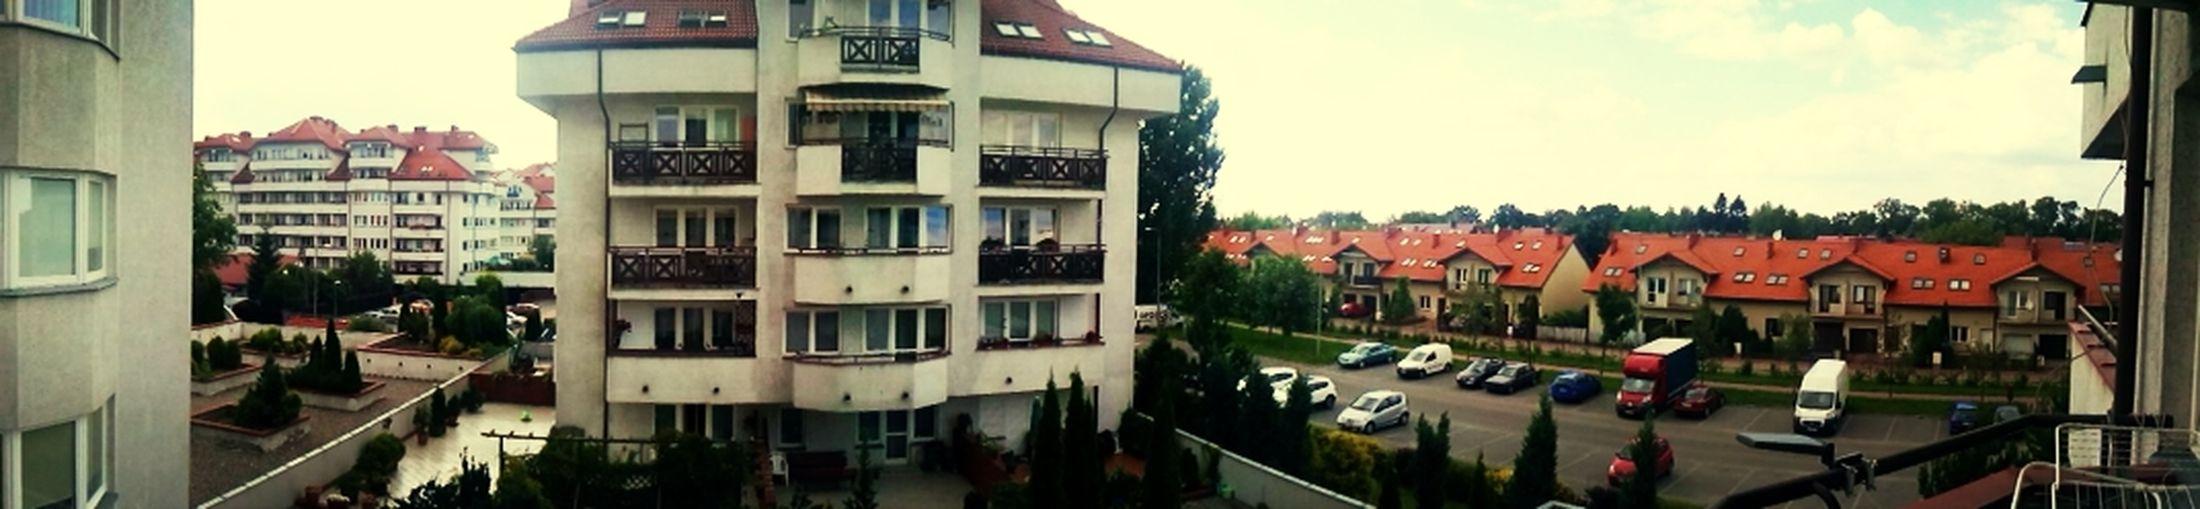 z balkoniku